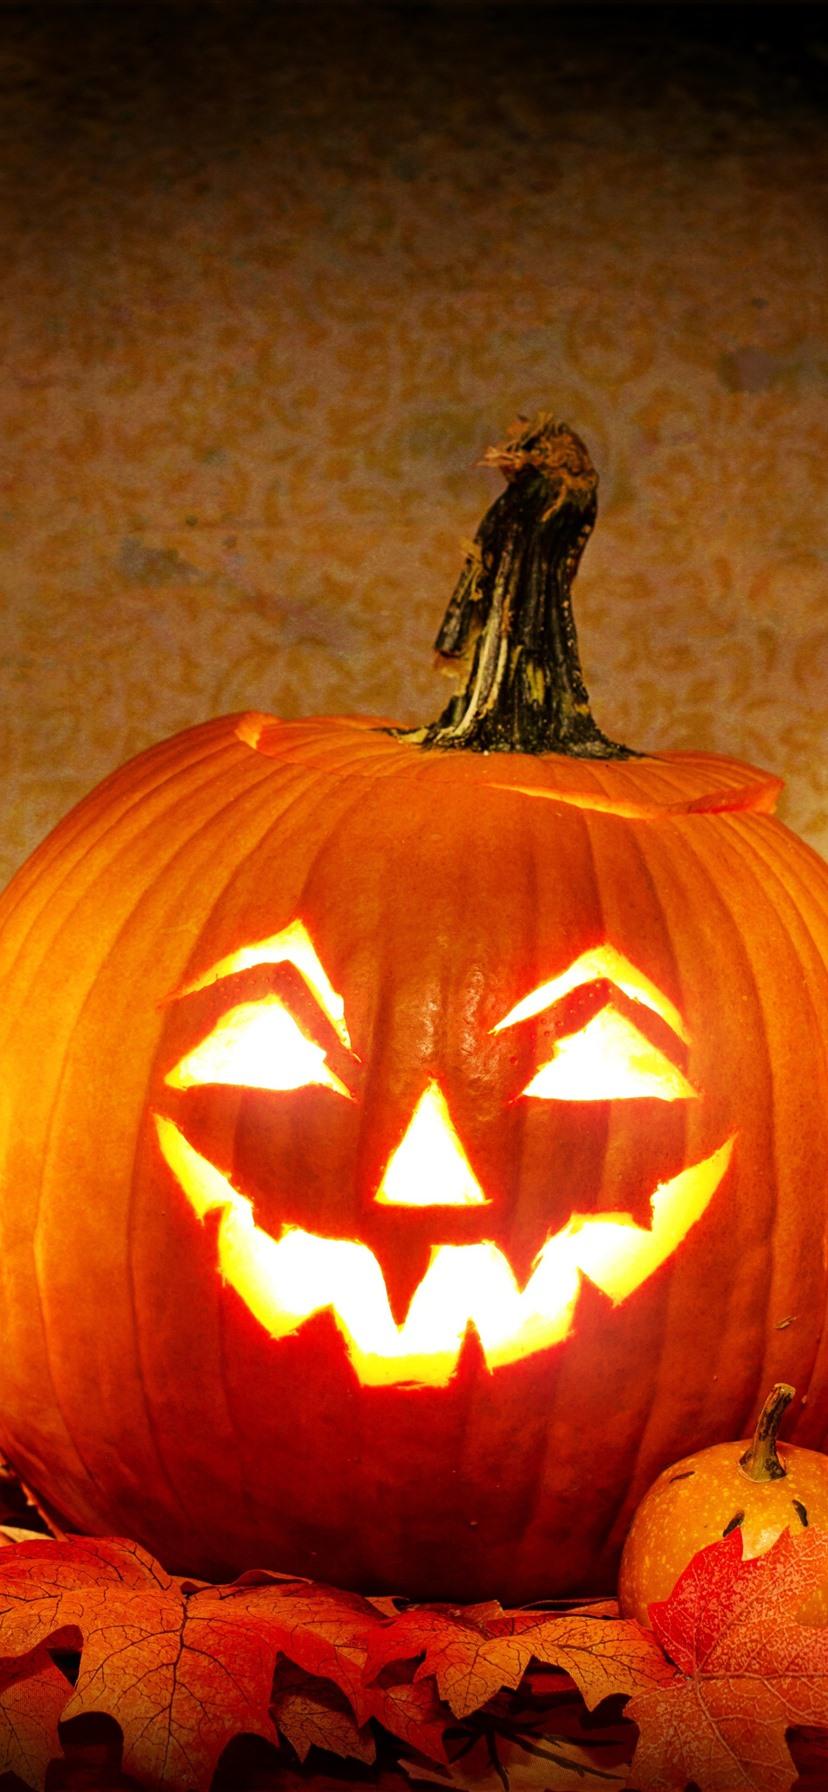 Halloween Pumpkin Bat Cat Lantern 1242x2688 Iphone 11 Pro Xs Max Wallpaper Background Picture Image